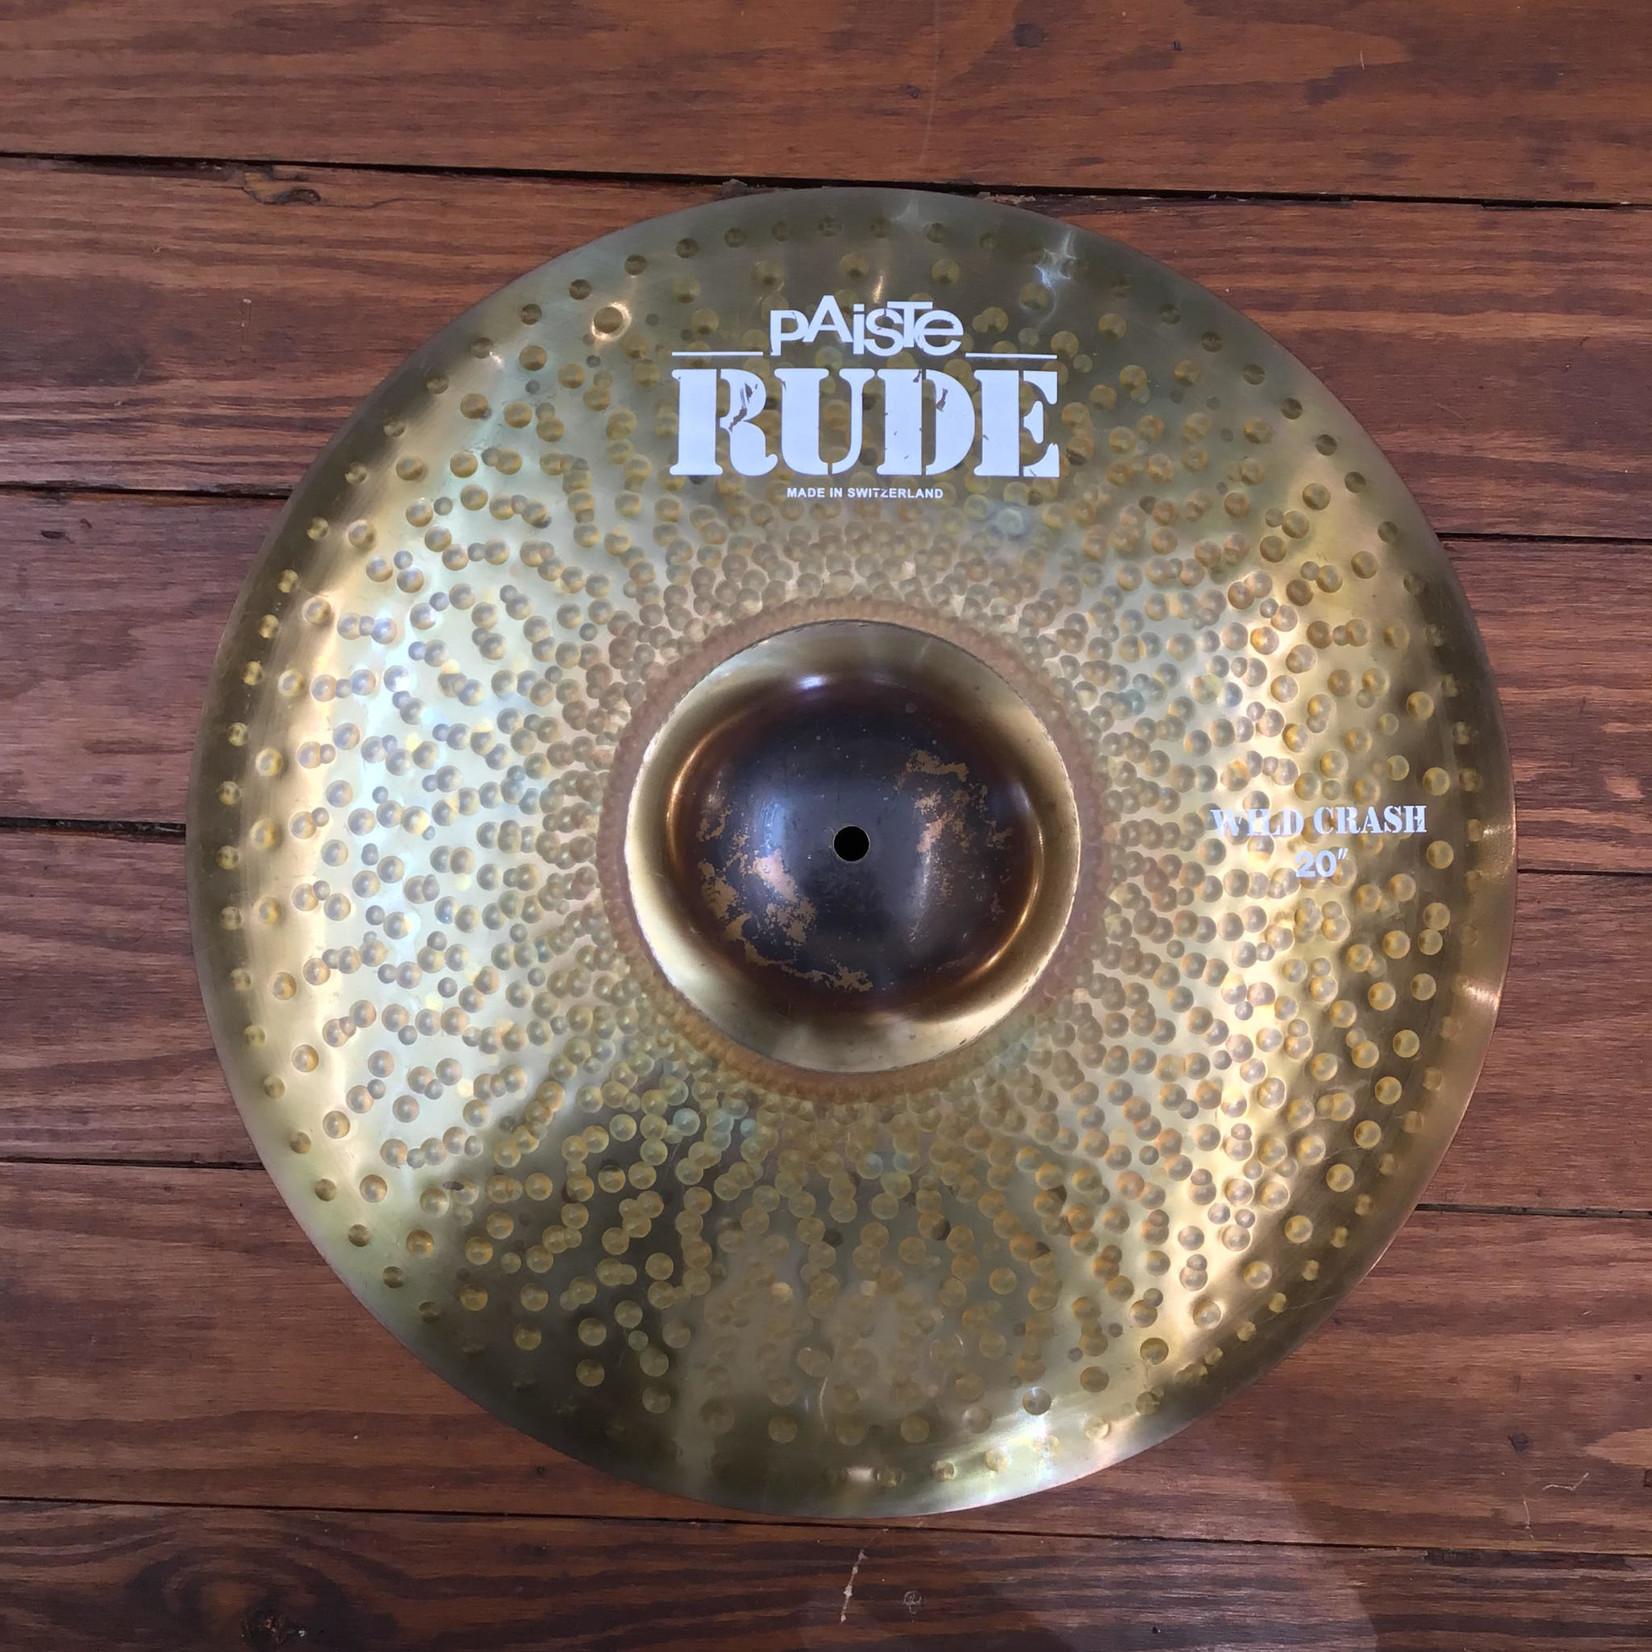 "Paiste USED Paiste RUDE 20"" Wild Crash Cymbal (Discontinued)"